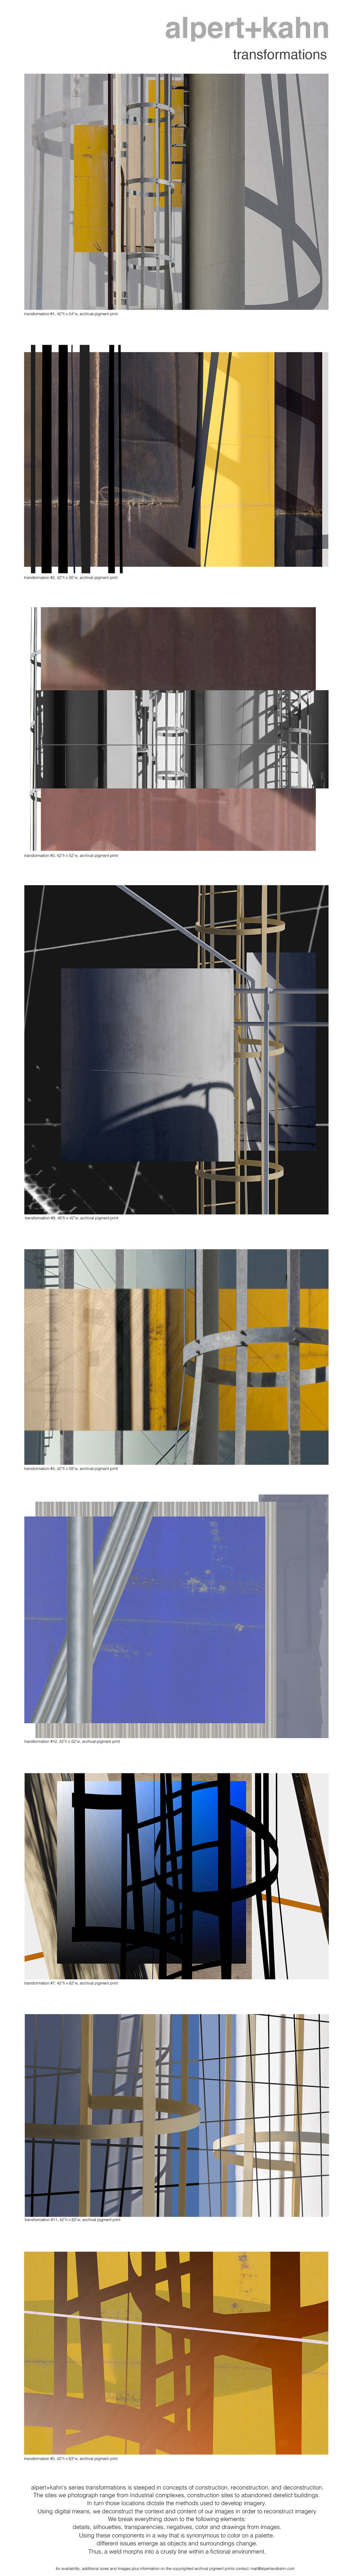 transformations-website 2-16-19,©alpert+kahn2018 .jpg